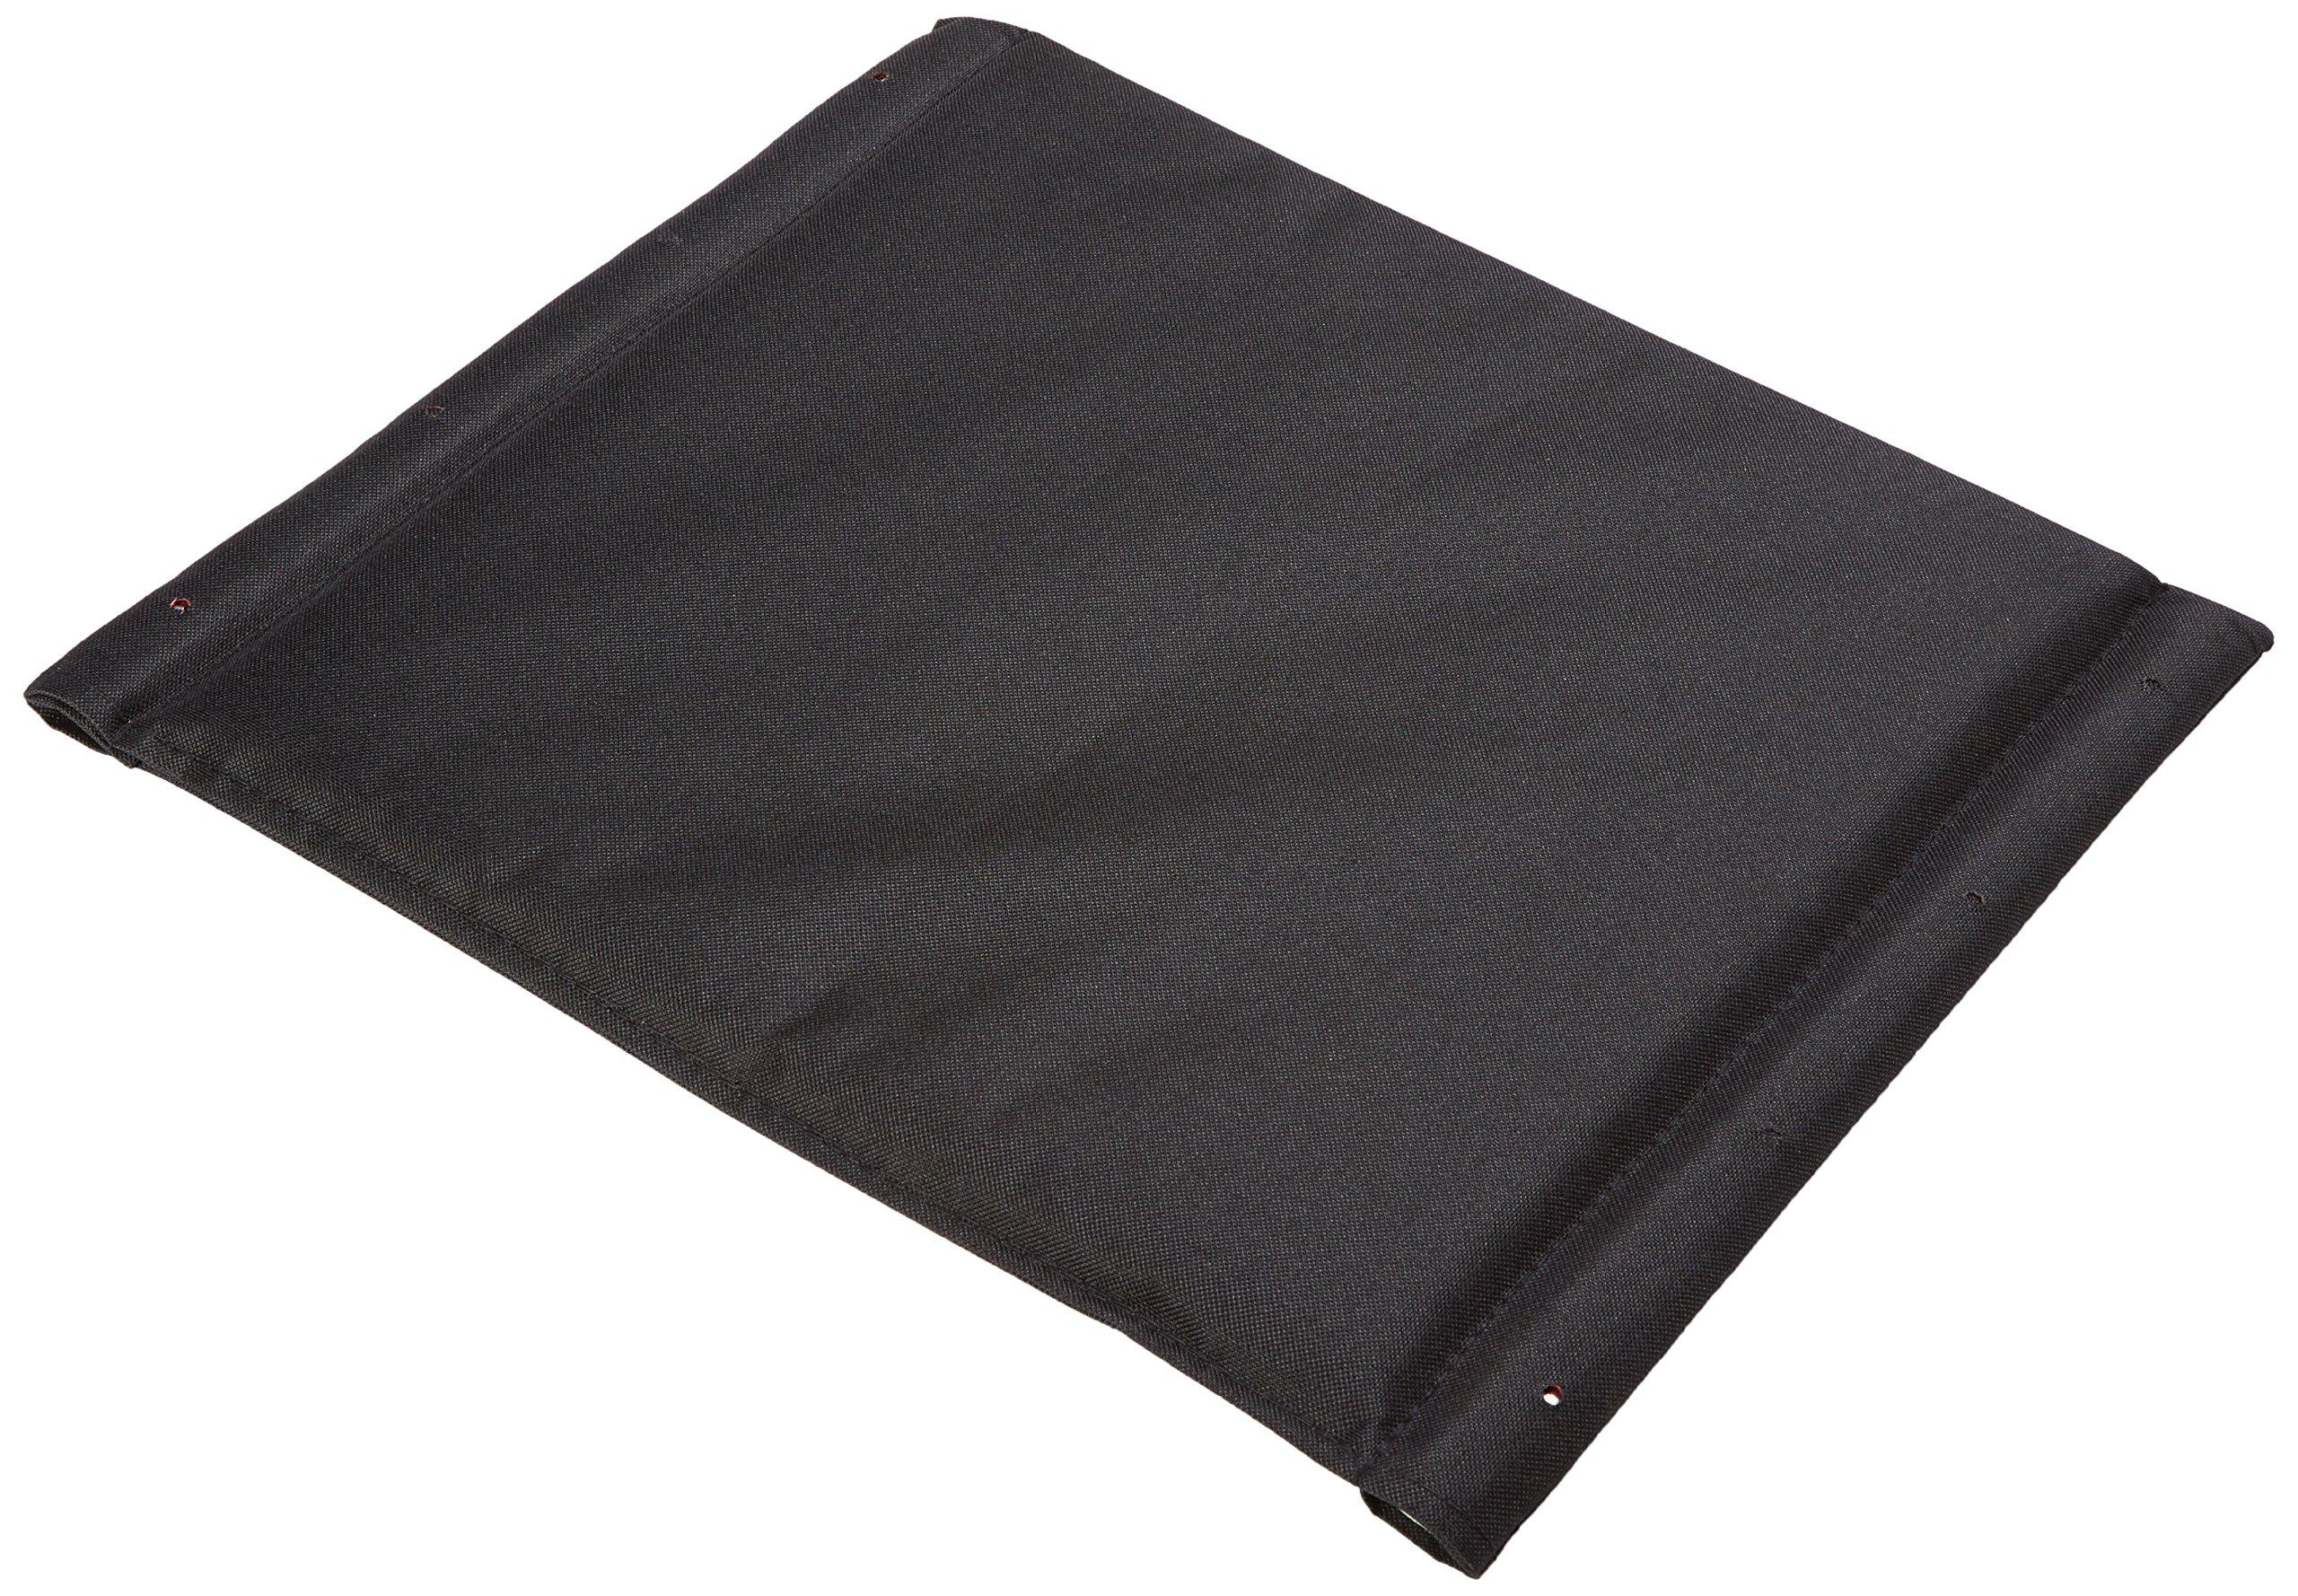 Graham-Field 907632B2 Seat Upholstery, 18W and Hardware, Black Nylon